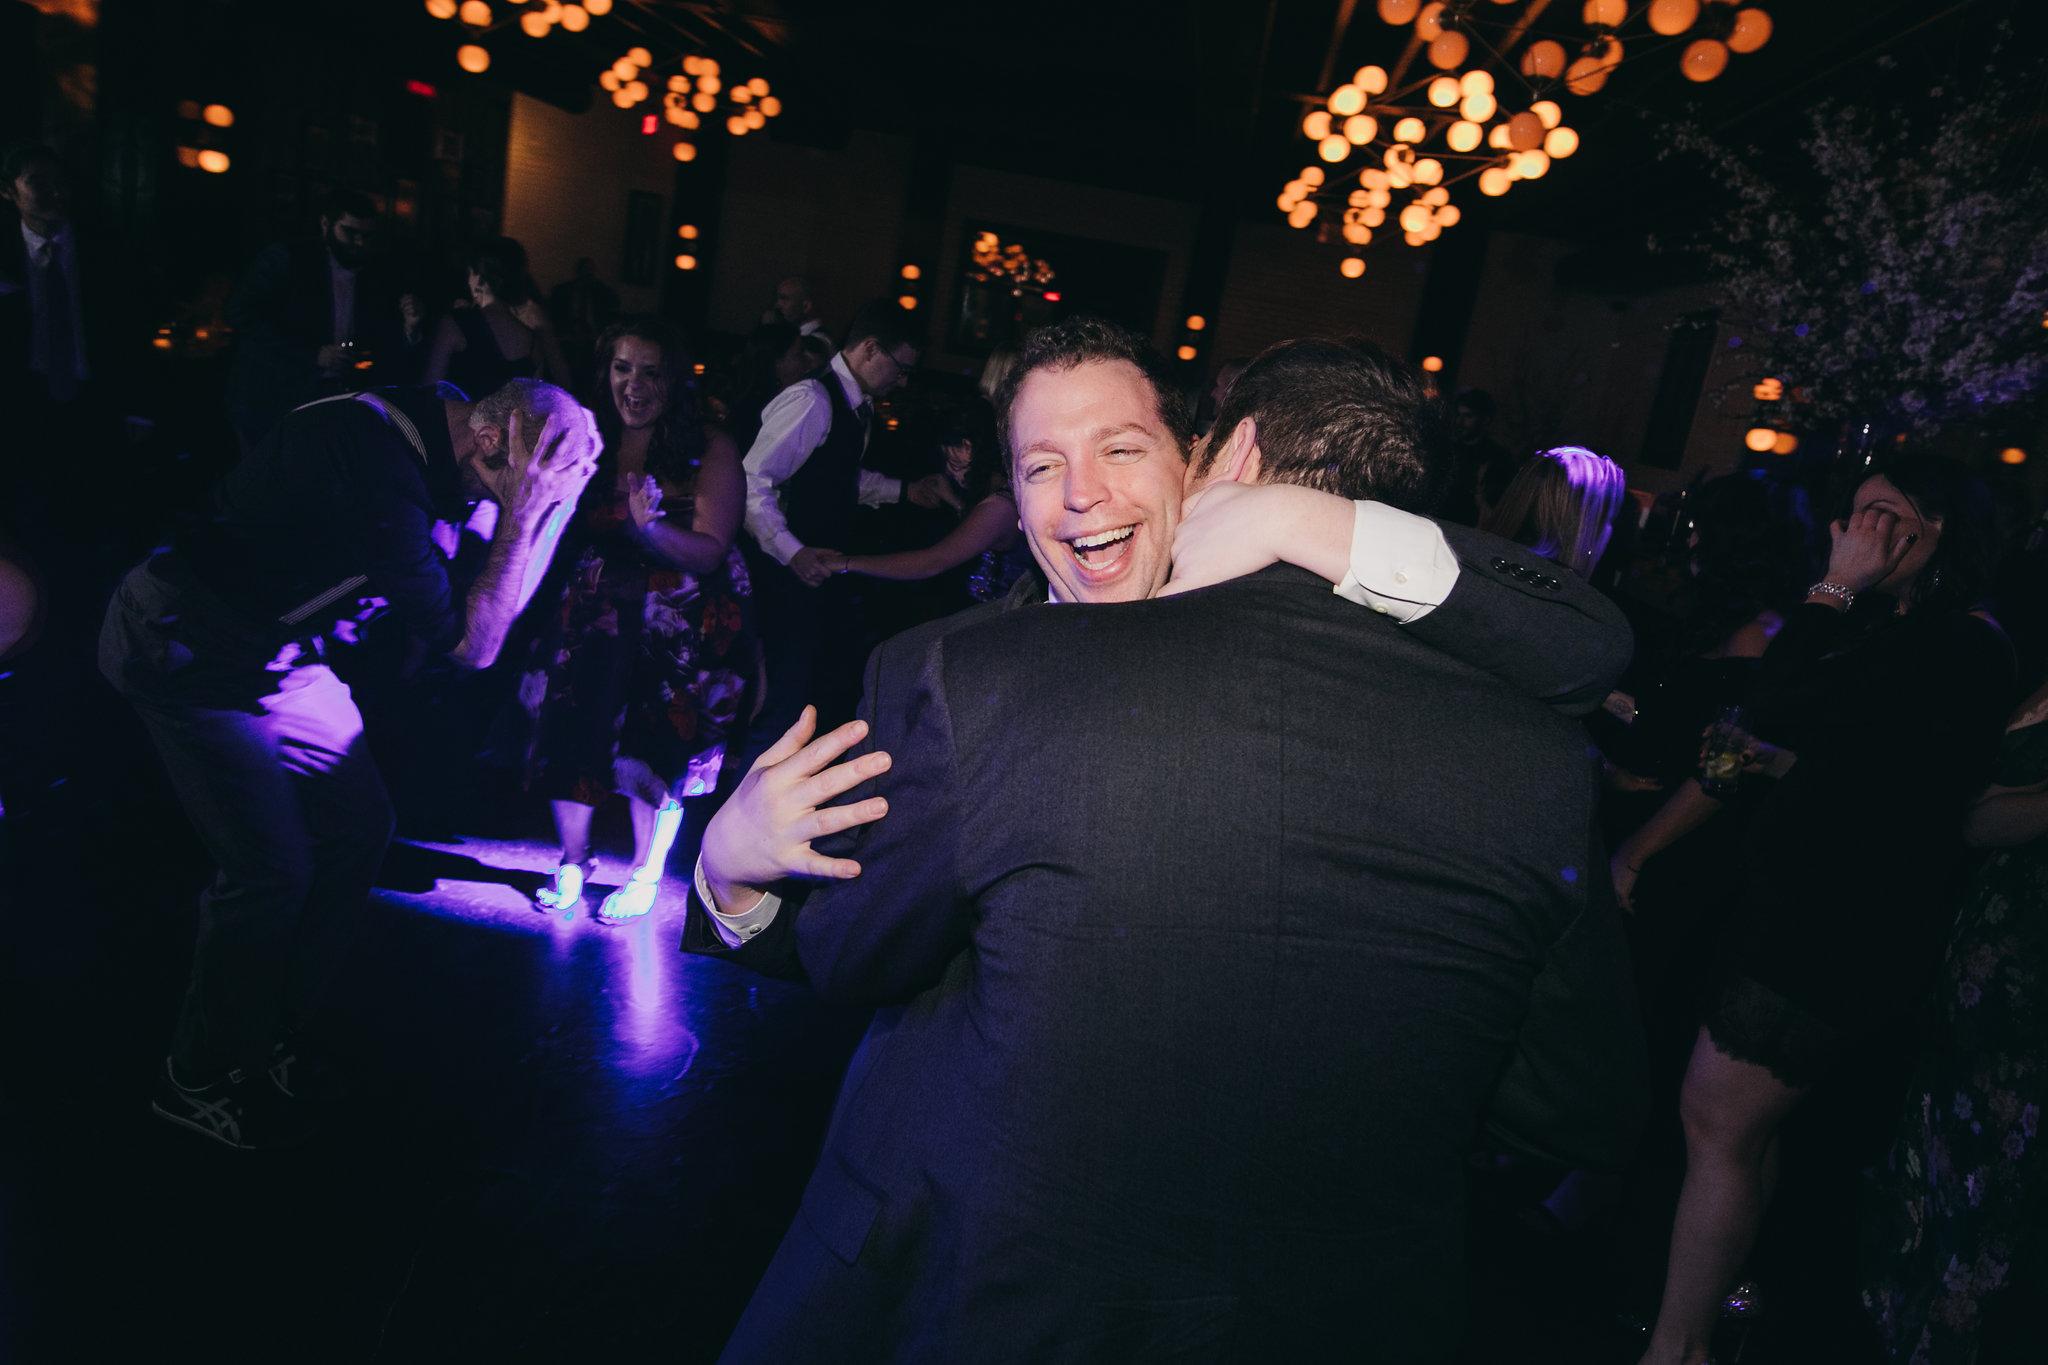 Peter-Eric-Wedding-630.jpg